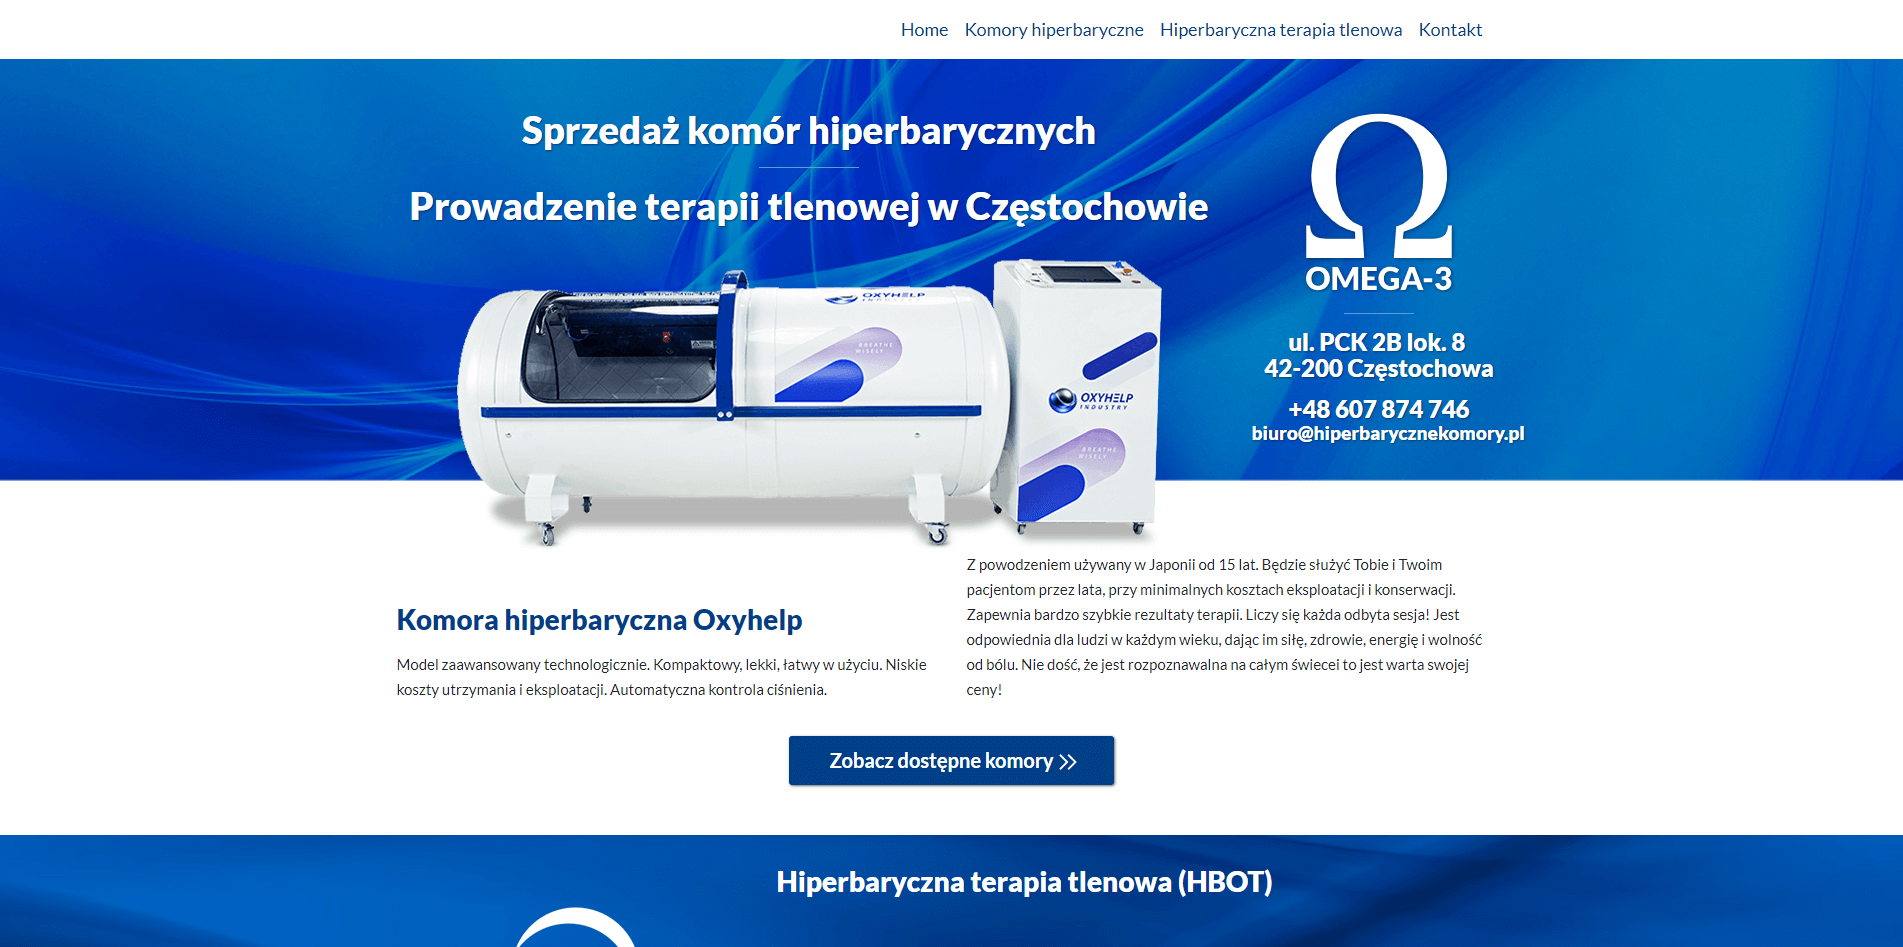 hiperbarycznekomory.pl